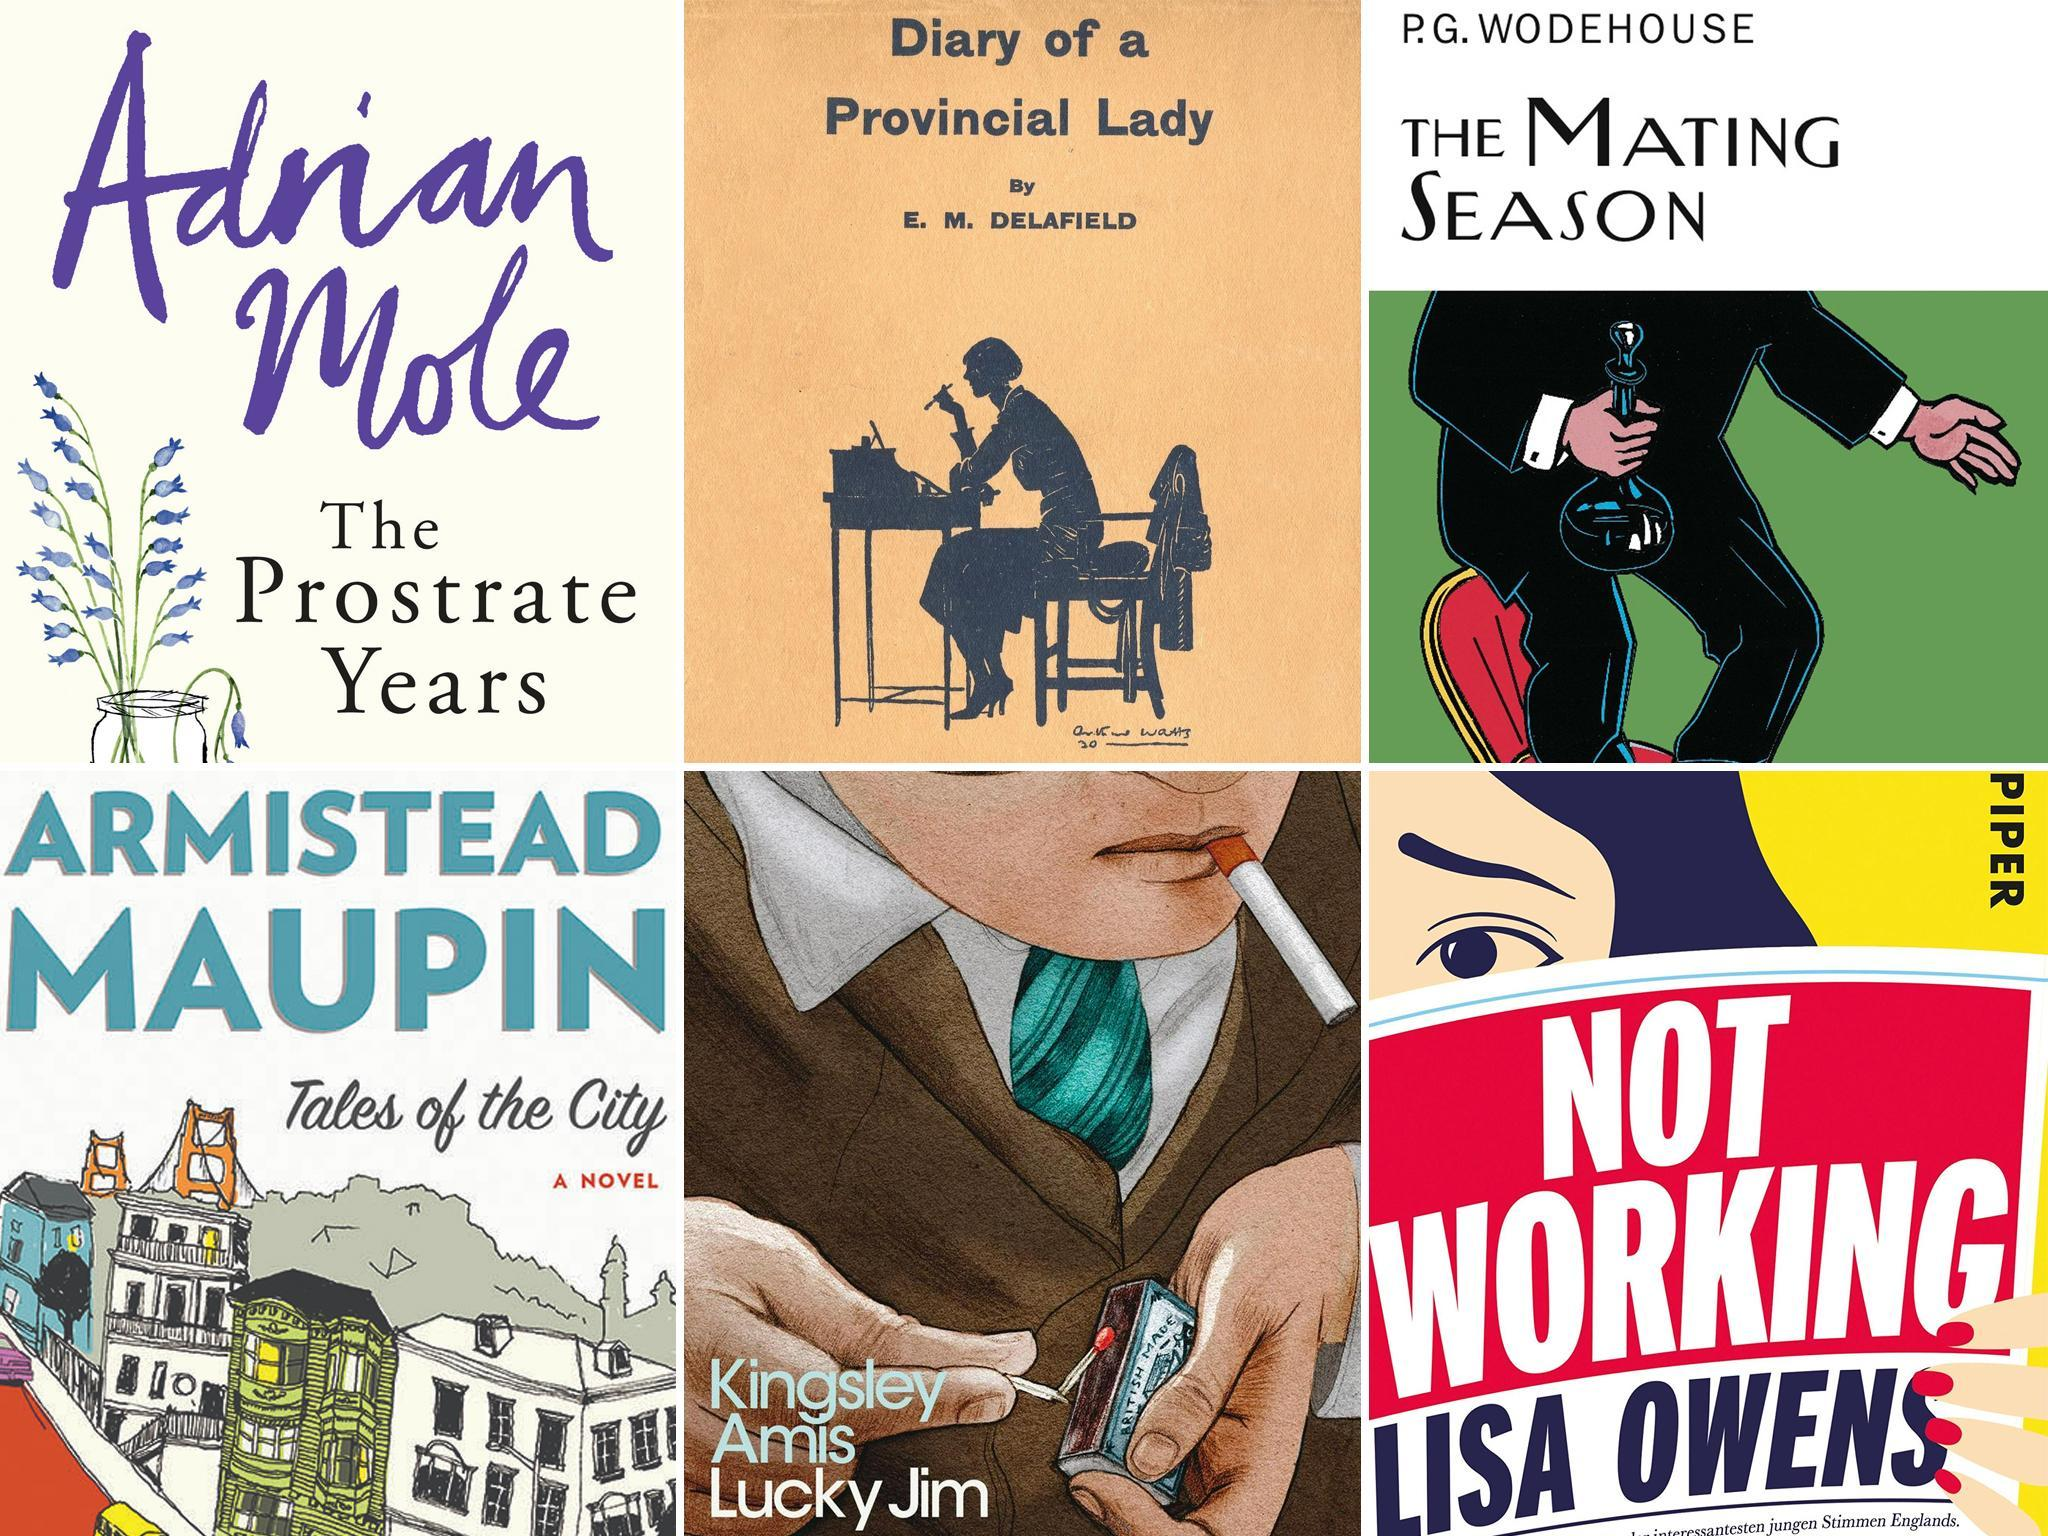 10 novels to help you beat the January blues